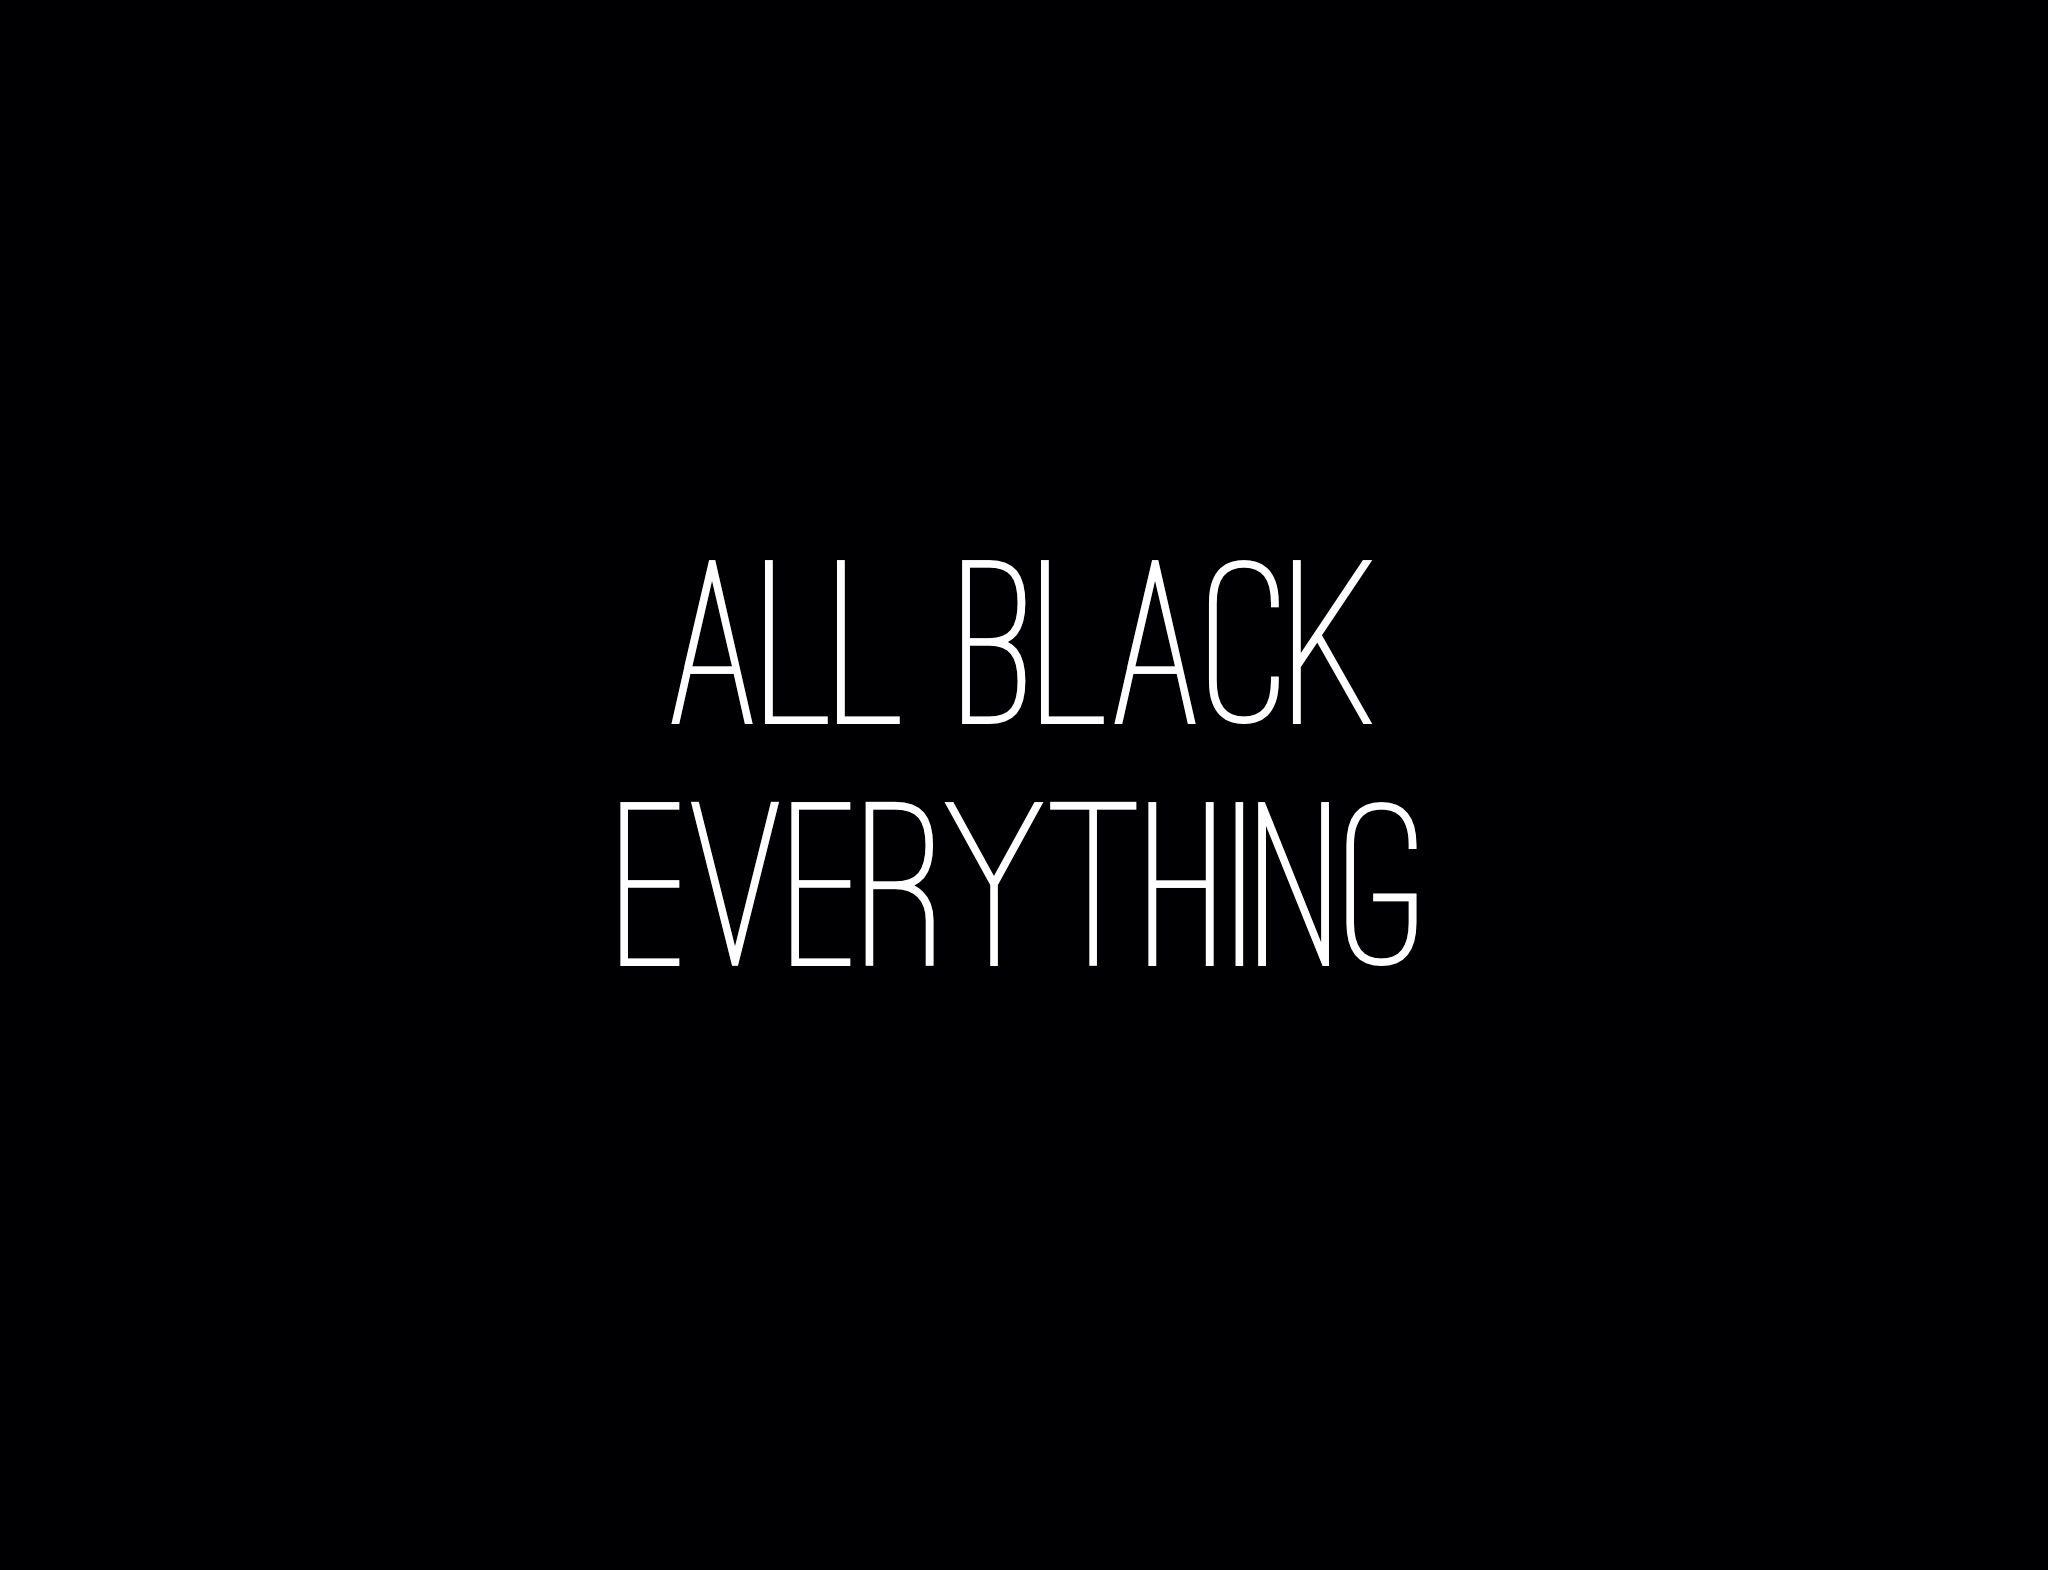 Everything Black 93